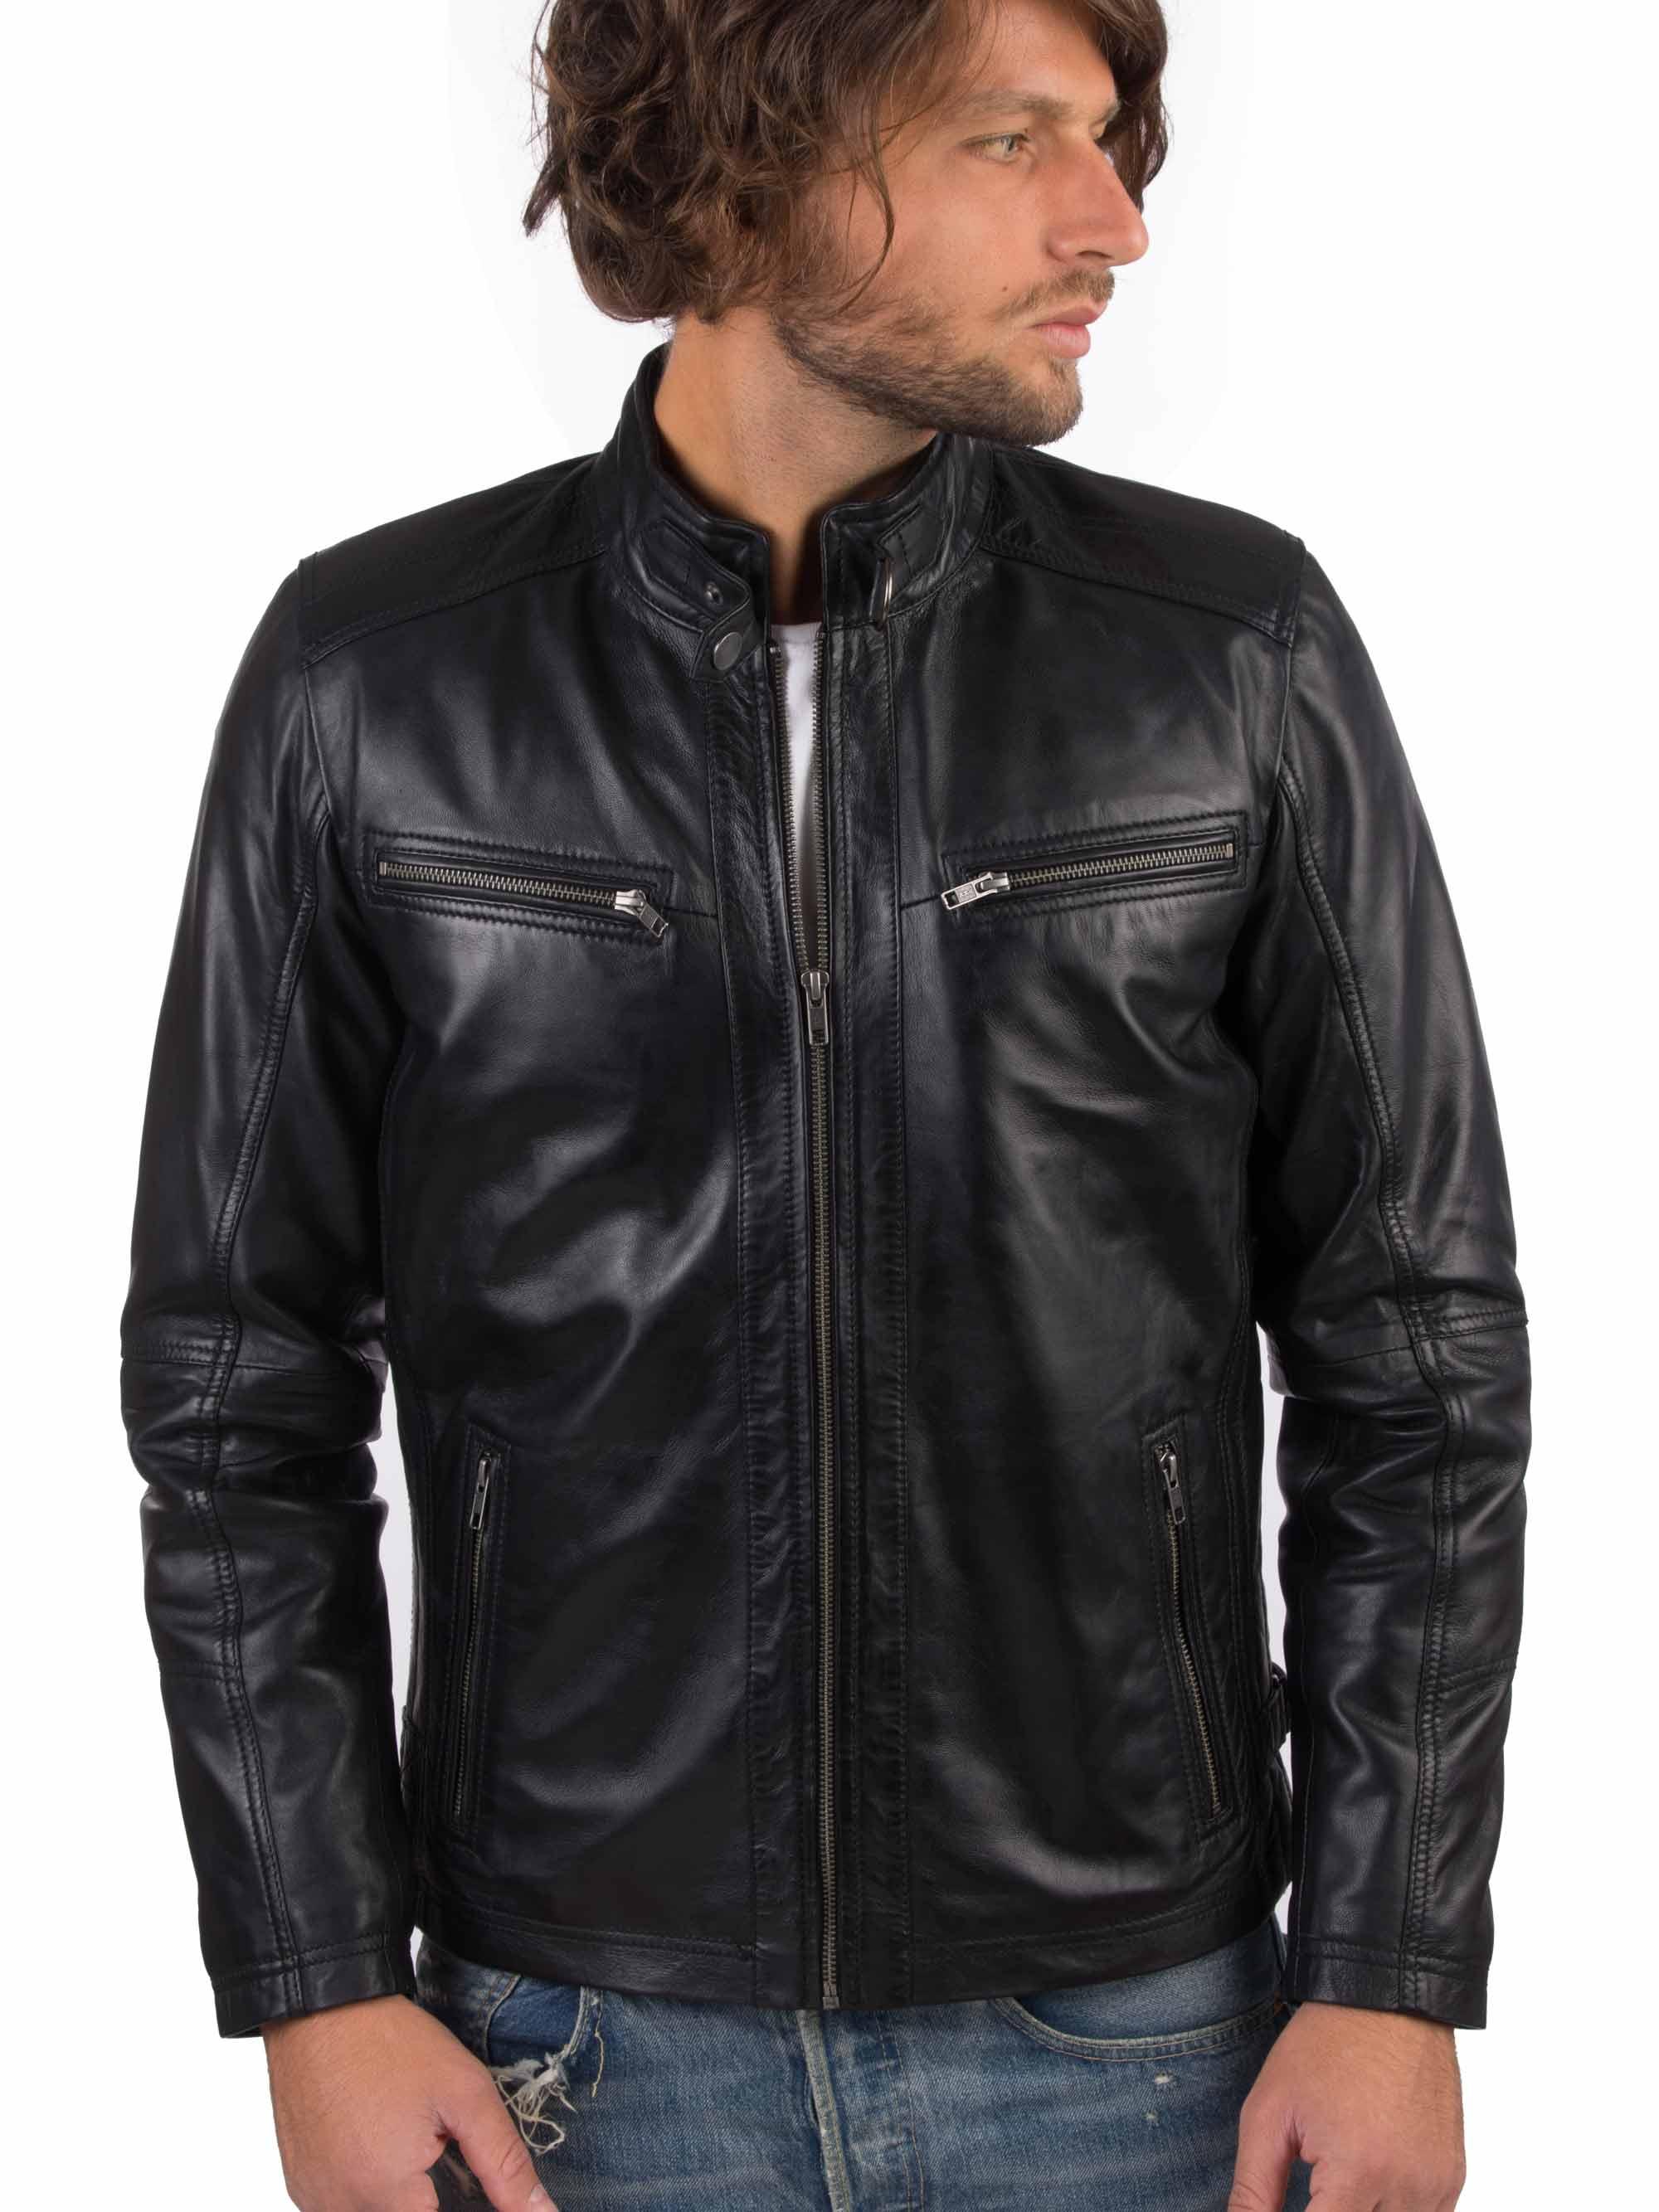 H8ce5a7a6232f4ae3b1a8ea859c88b7eaq VAINAS European Brand Mens Genuine Leather jacket for men Winter Real sheep leather jacket Motorcycle jackets Biker jackets Alfa